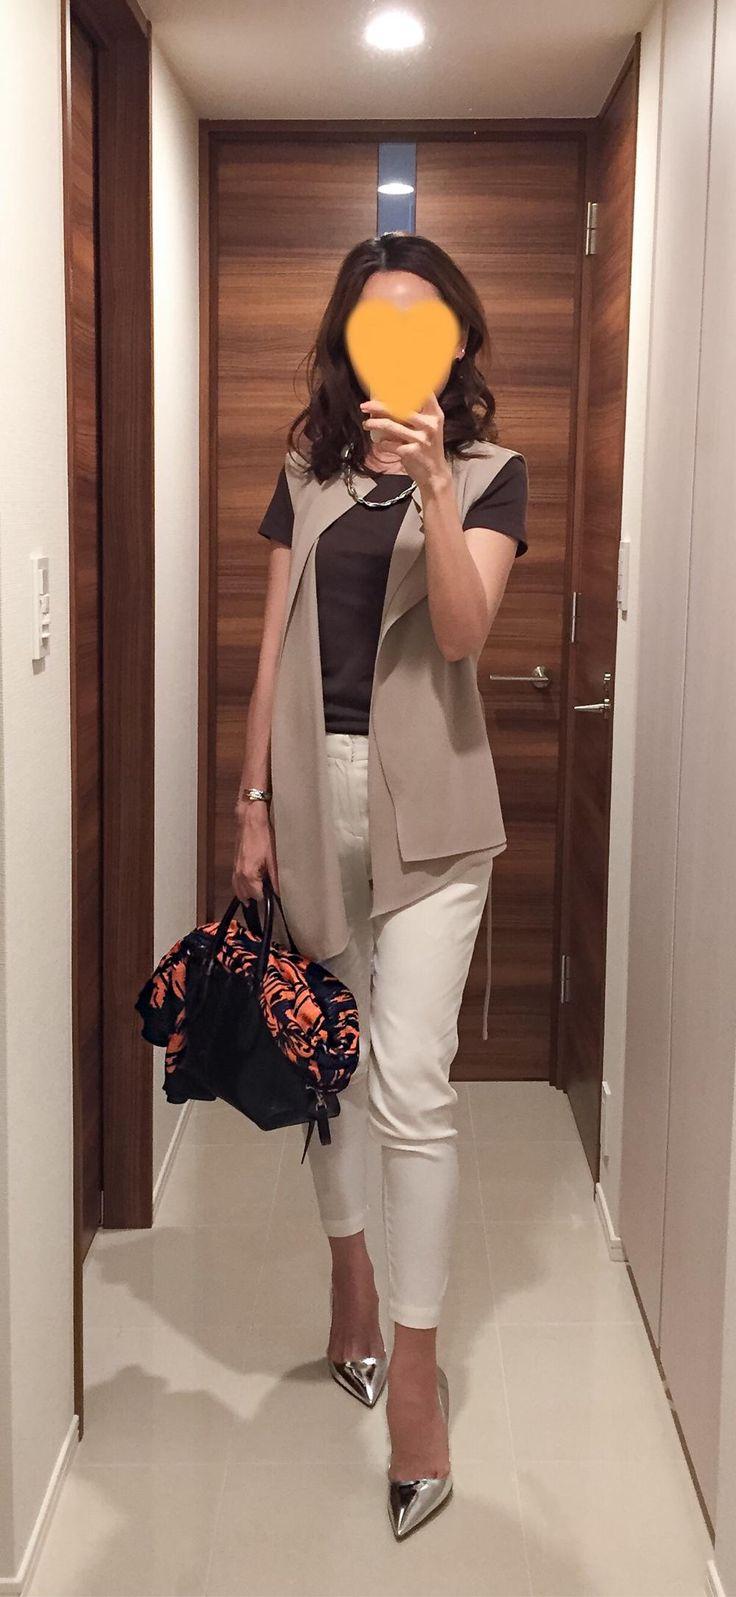 Vest: ZARA, Brown tee: Uniqlo, White pants: Des Pres, Bag: Tod's, Silver heels: PRADA